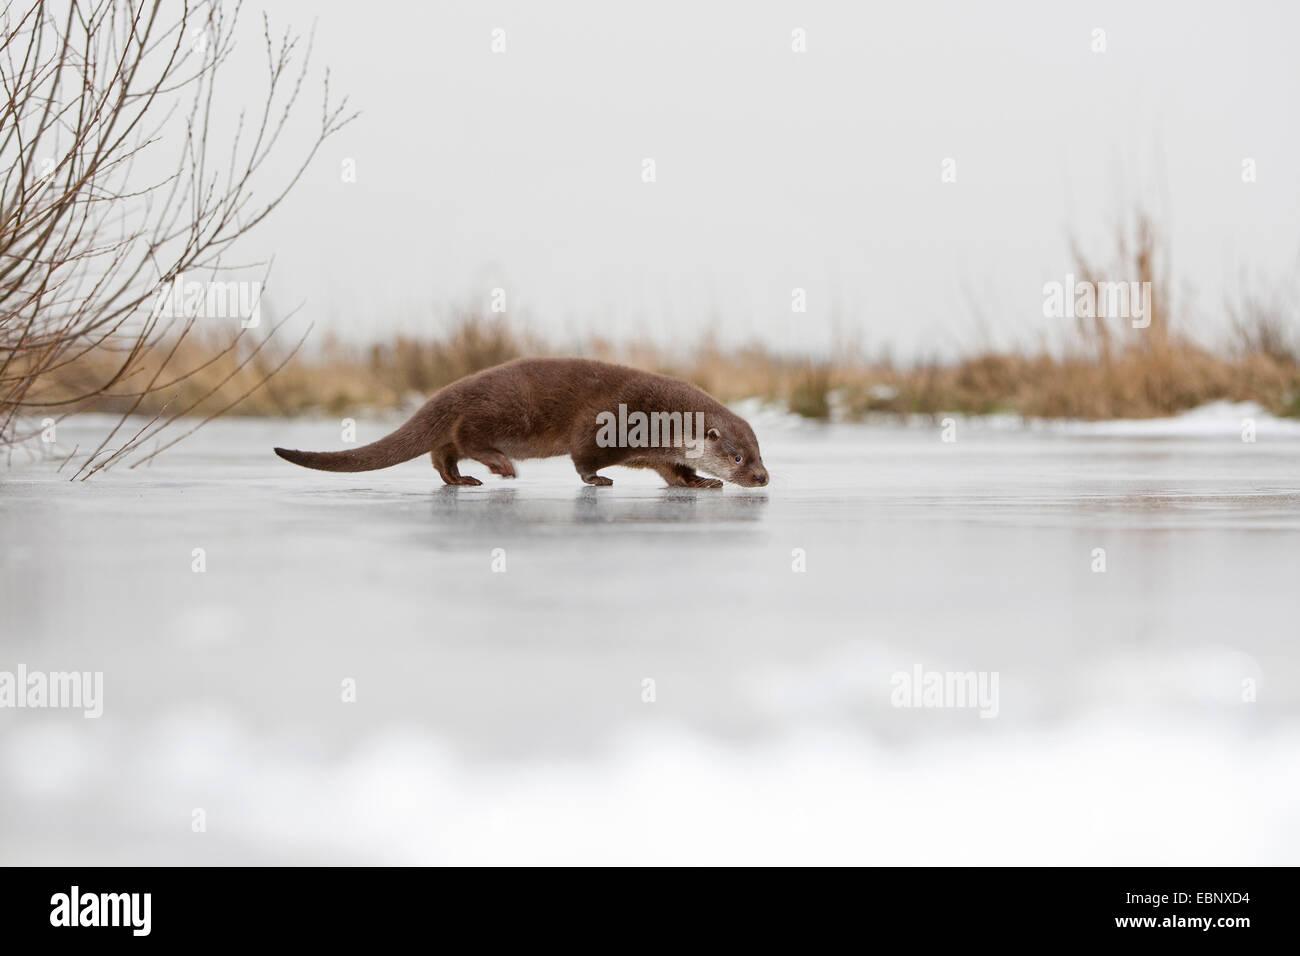 Europäischen Fischotter, europäischer Fischotter, eurasische Fischotter (Lutra Lutra), weibliche zu Fuß Stockbild